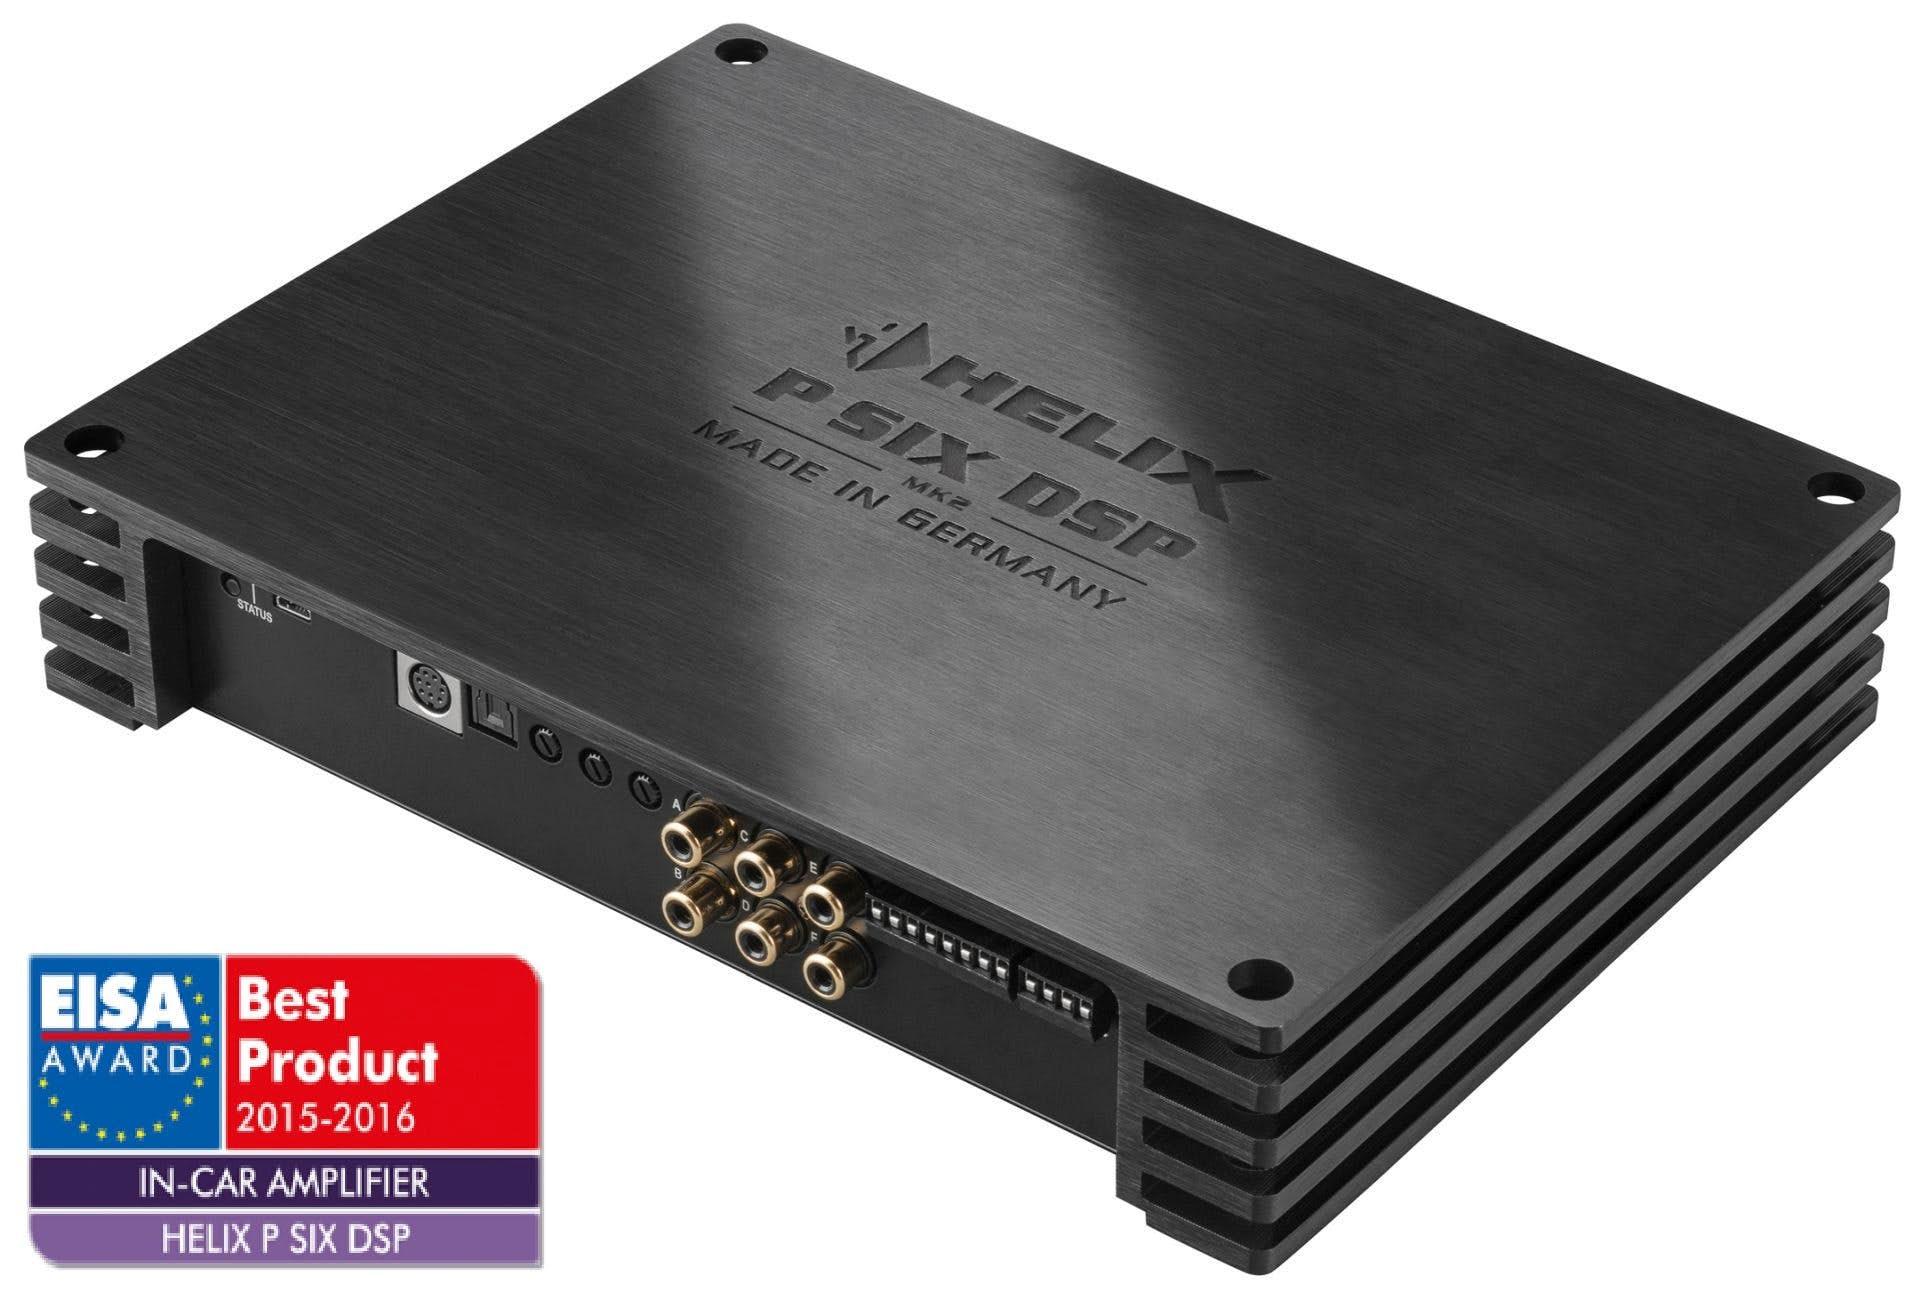 Zvočni procesor Helix P SIX DSP MK2